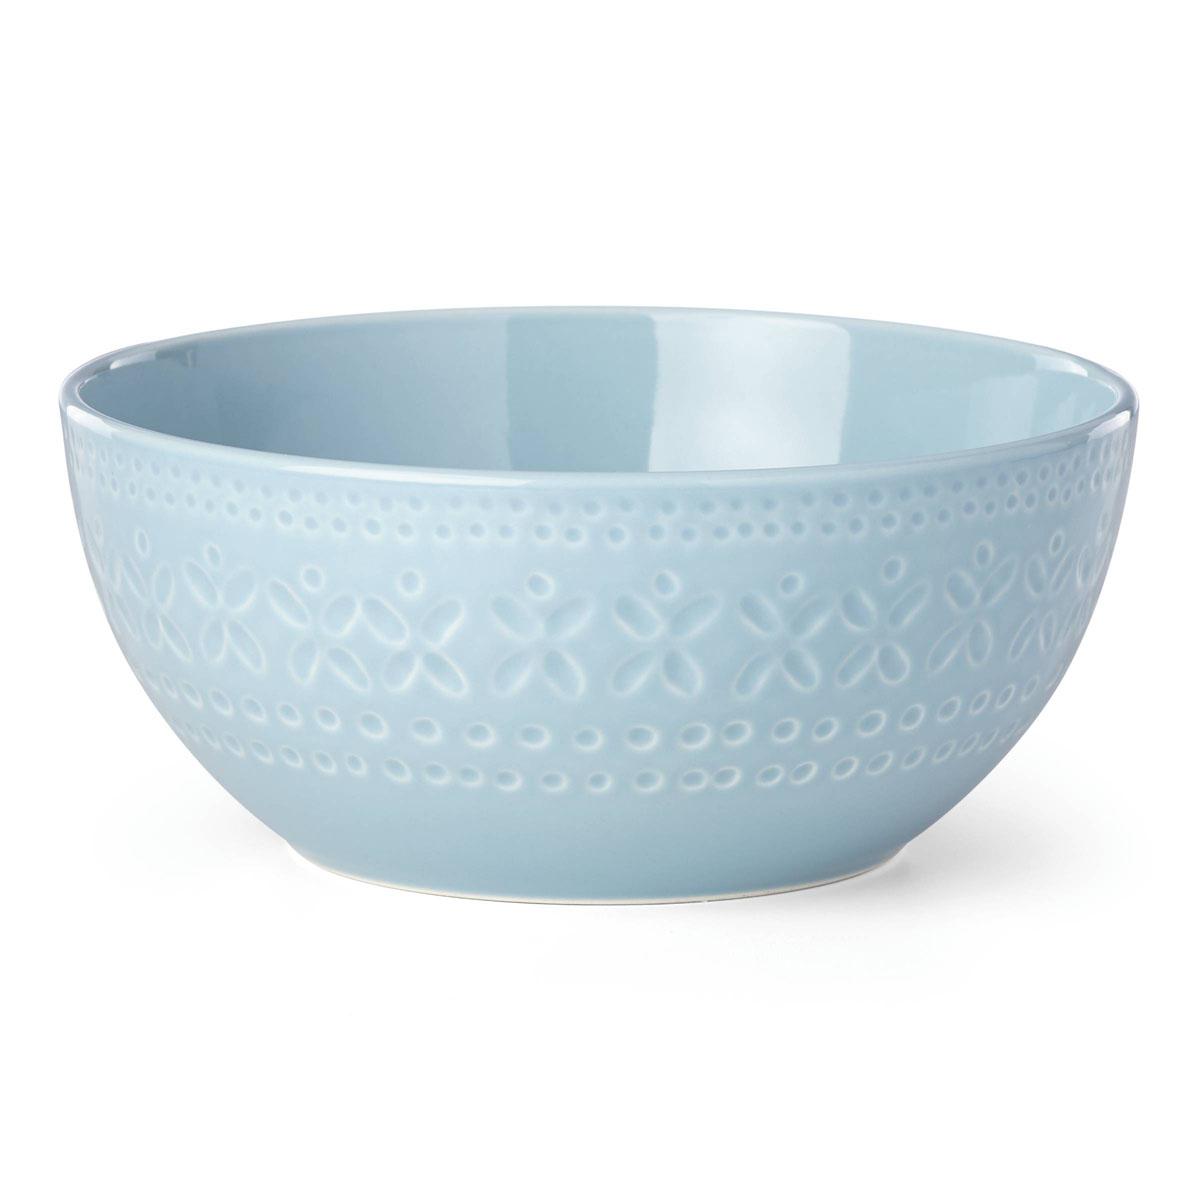 kate spade new york Lenox Stoneware Willow Drive Blue Serve Bowl